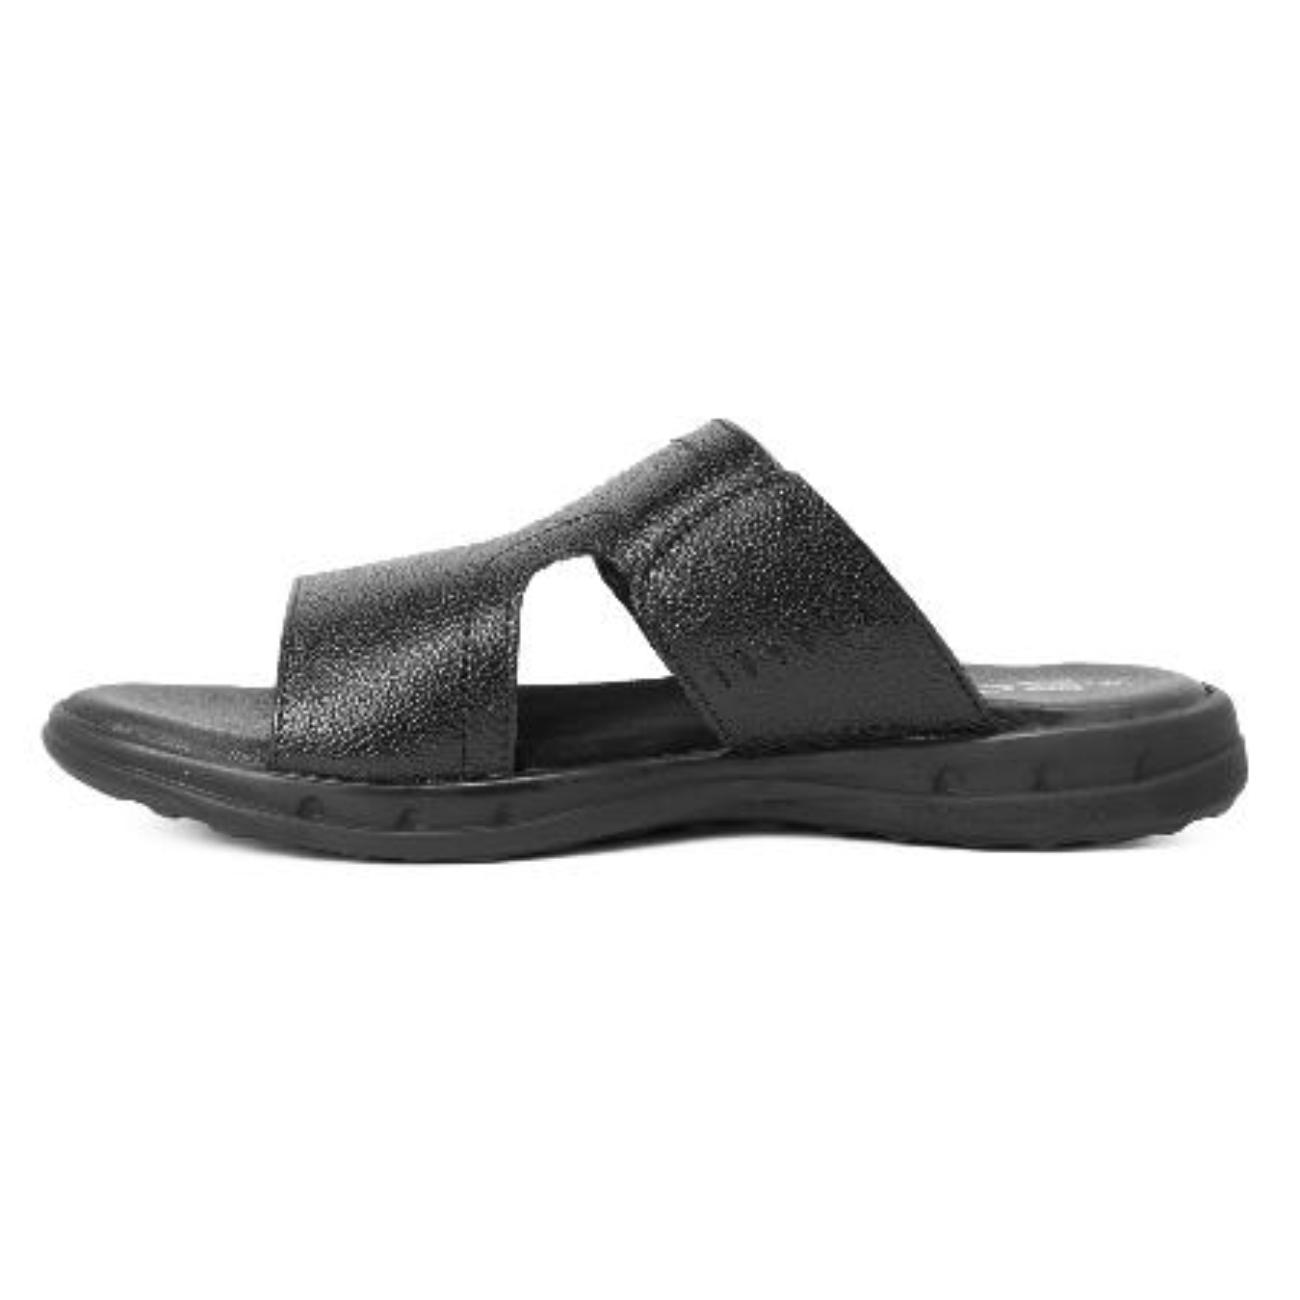 black slip-on sandals side view_2